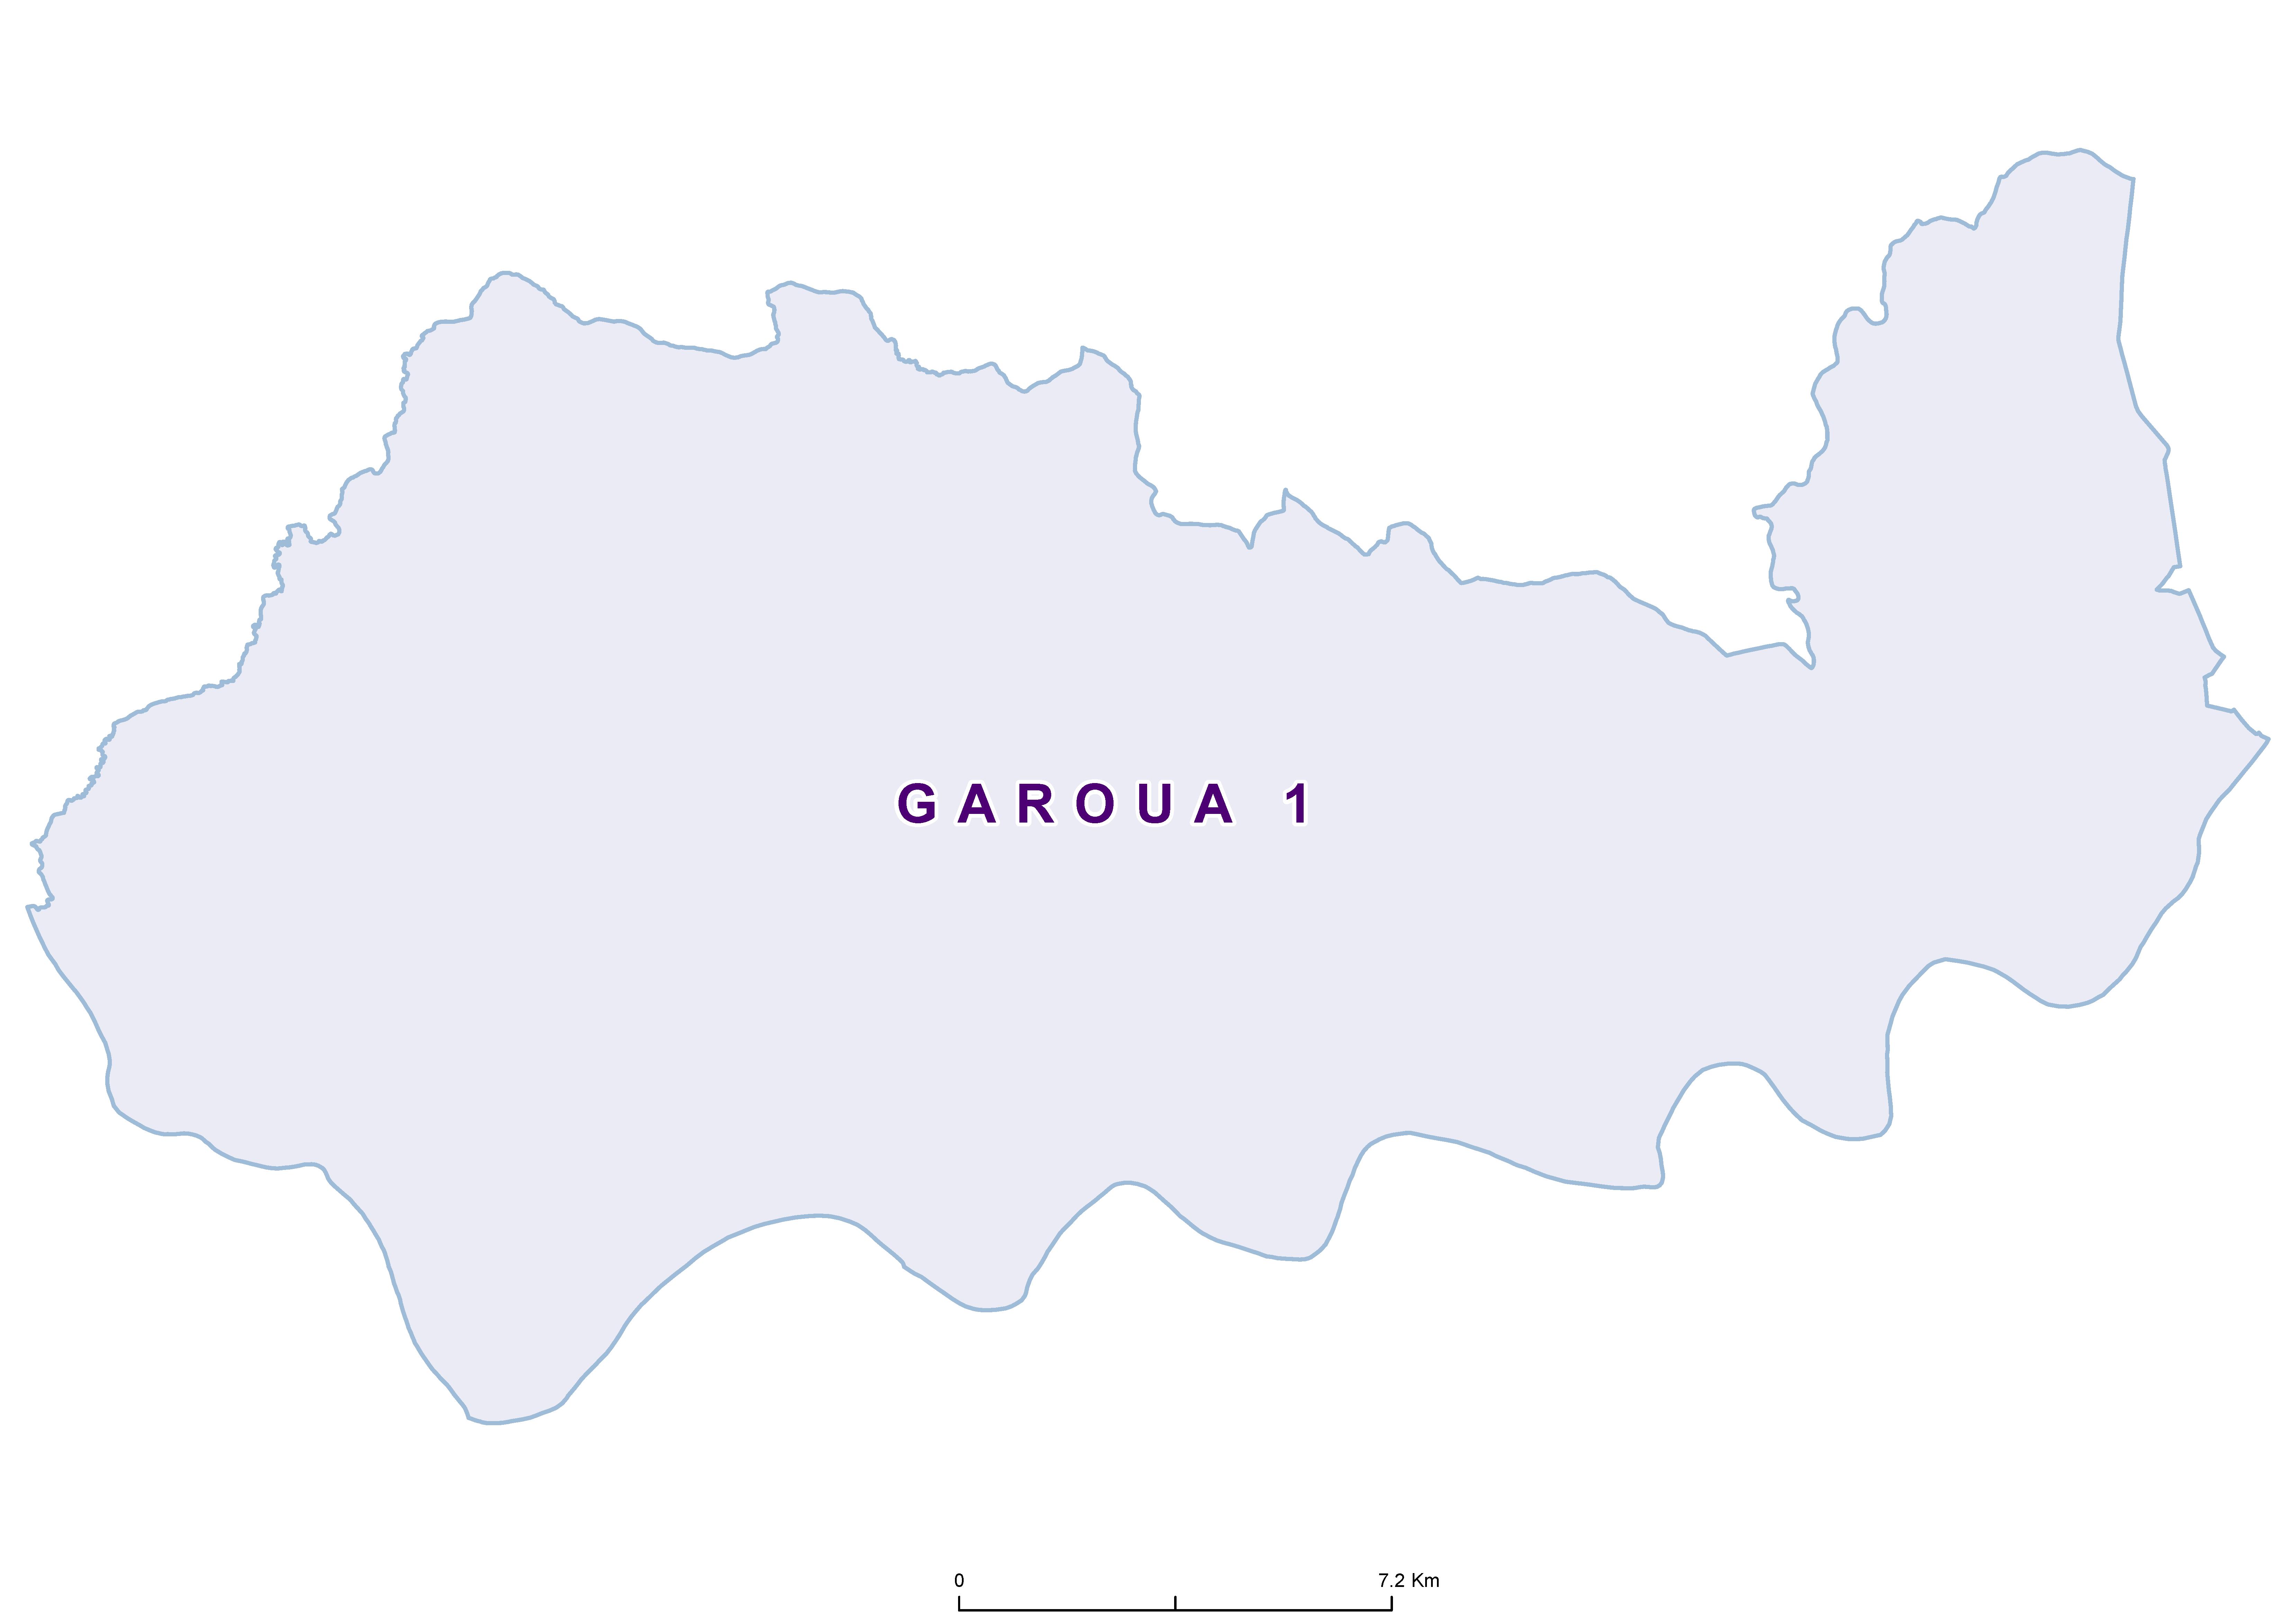 Garoua 1 Mean SCH 20180001